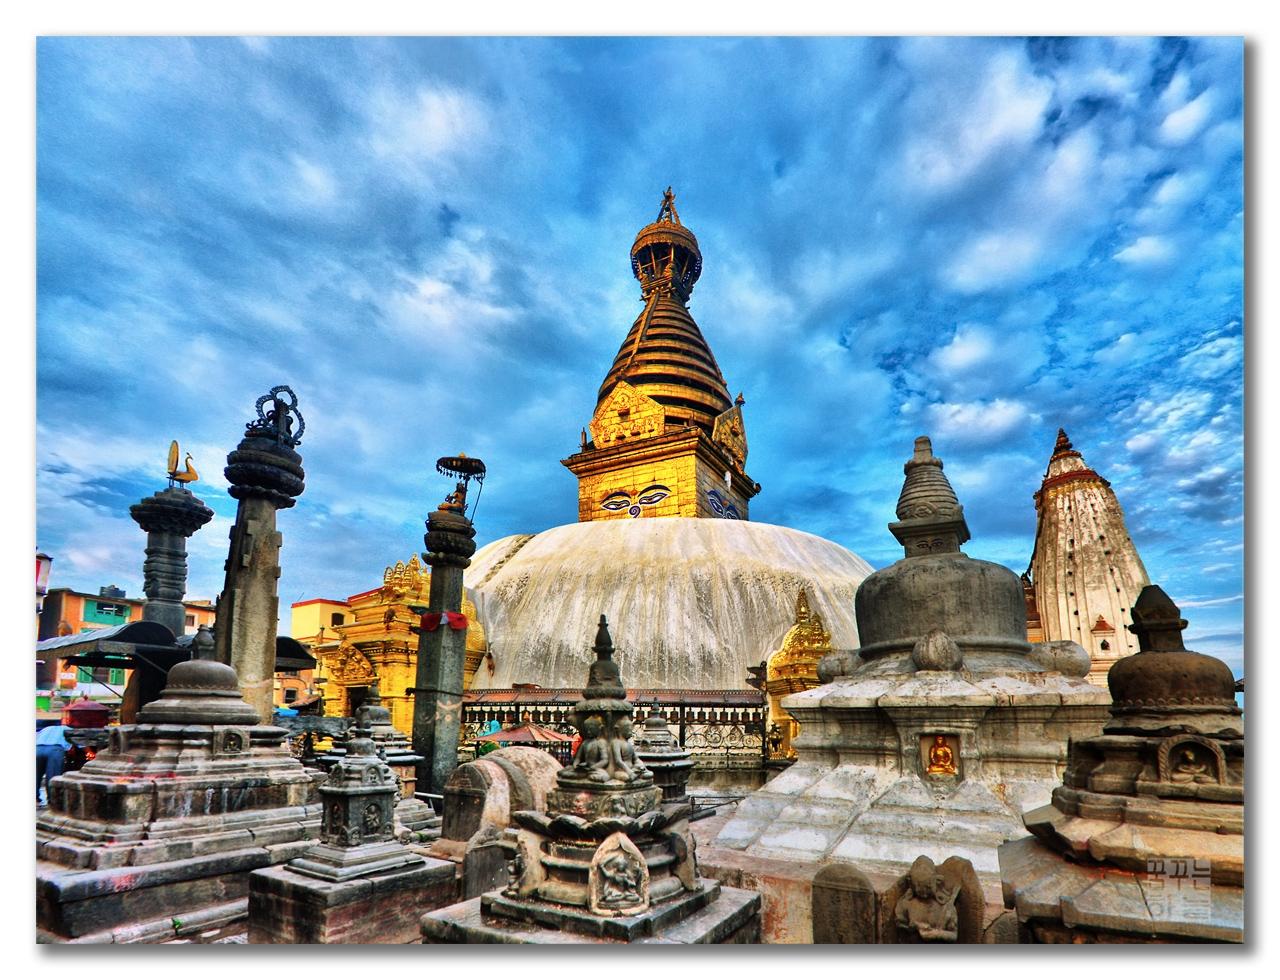 Nepal nature background 3 1280x980